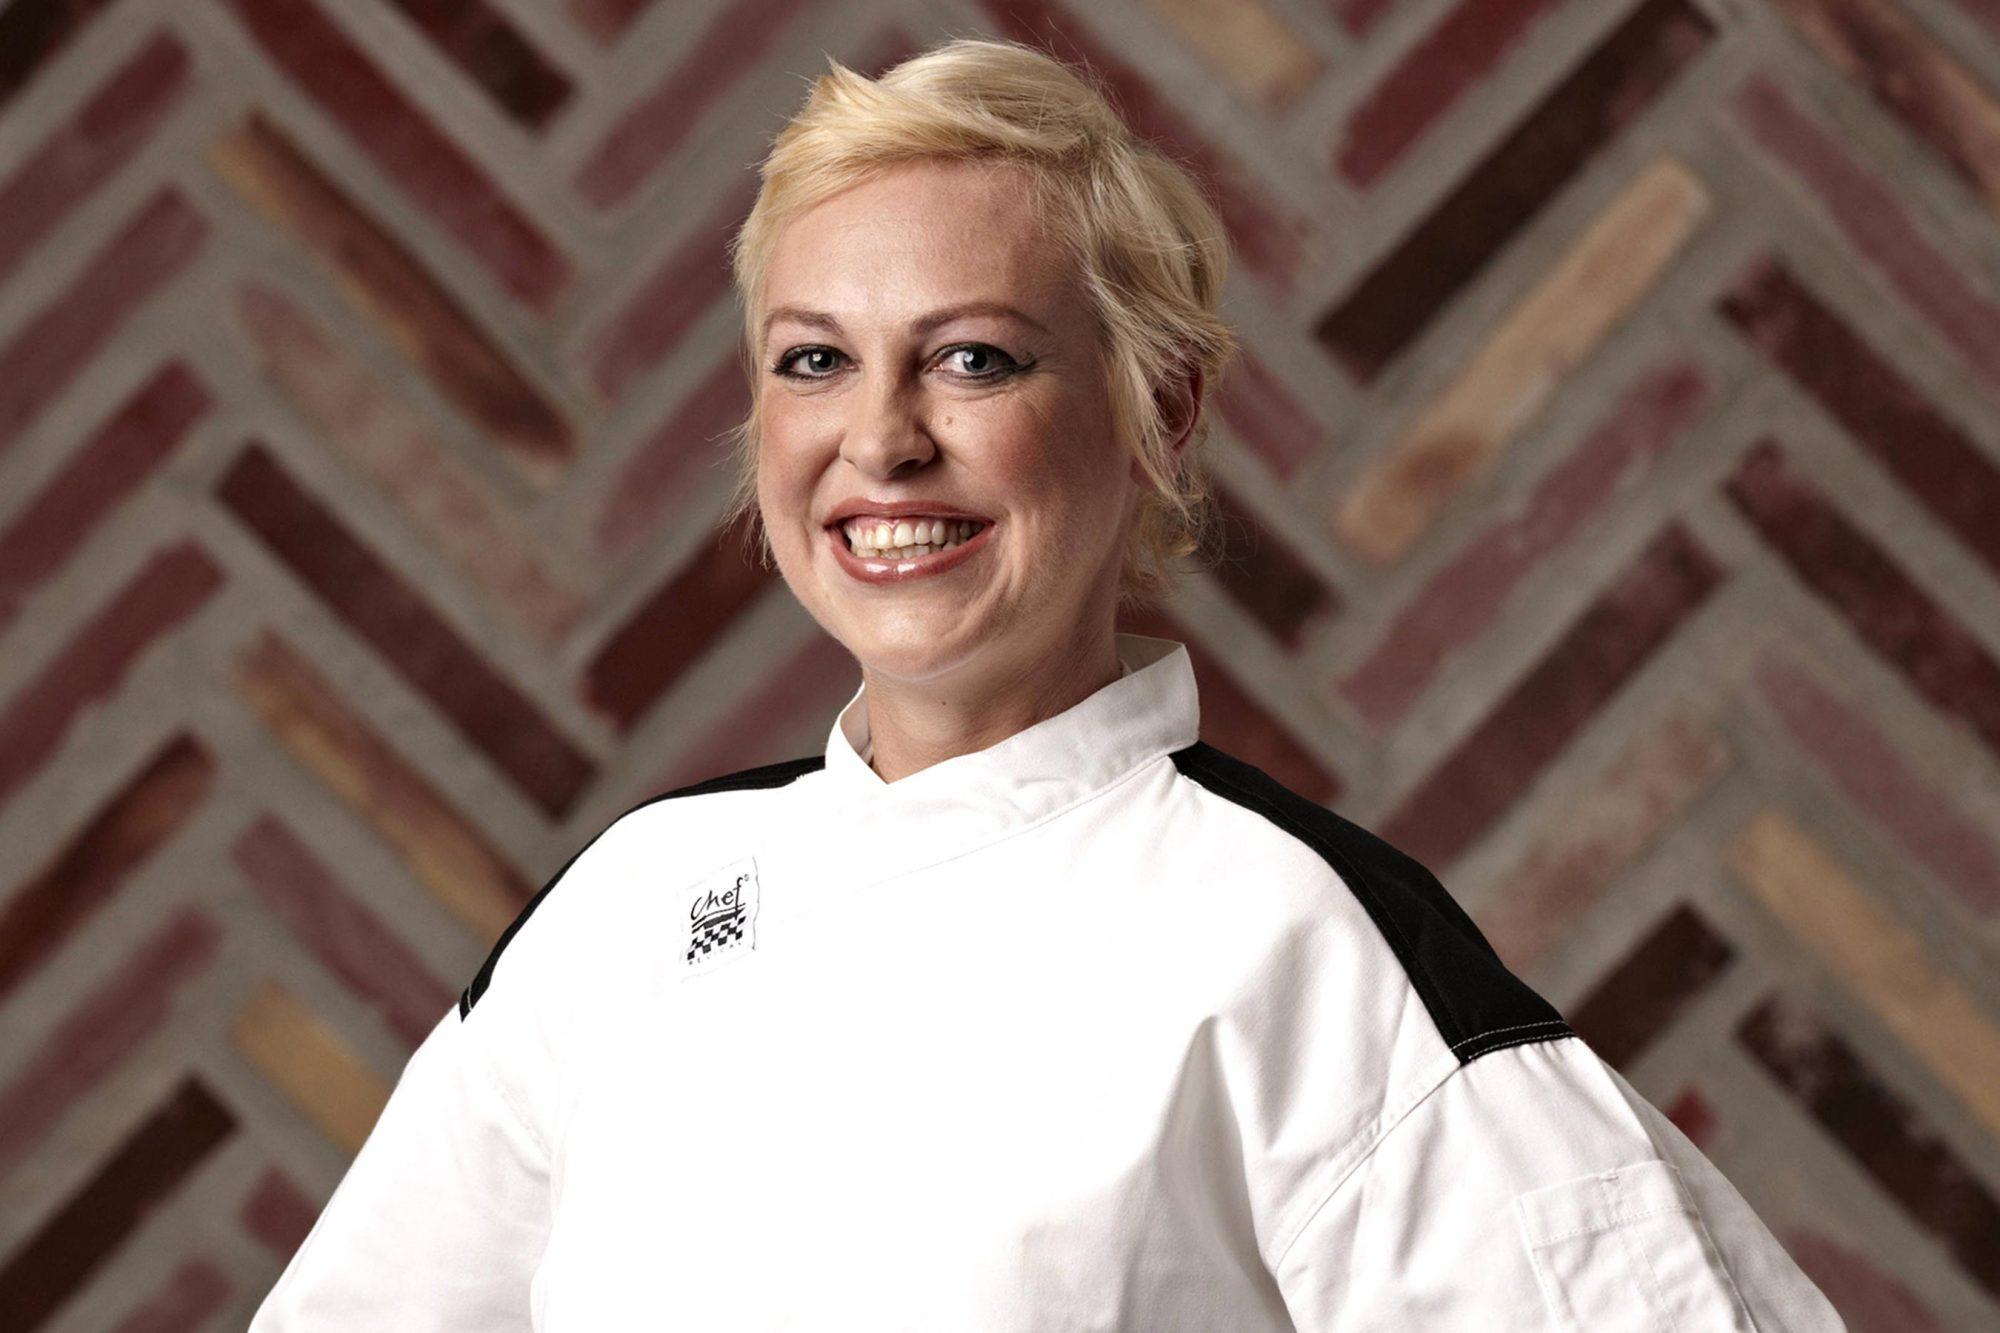 Hell S Kitchen Contestant Jessica Vogel Dies At 34 Ew Com